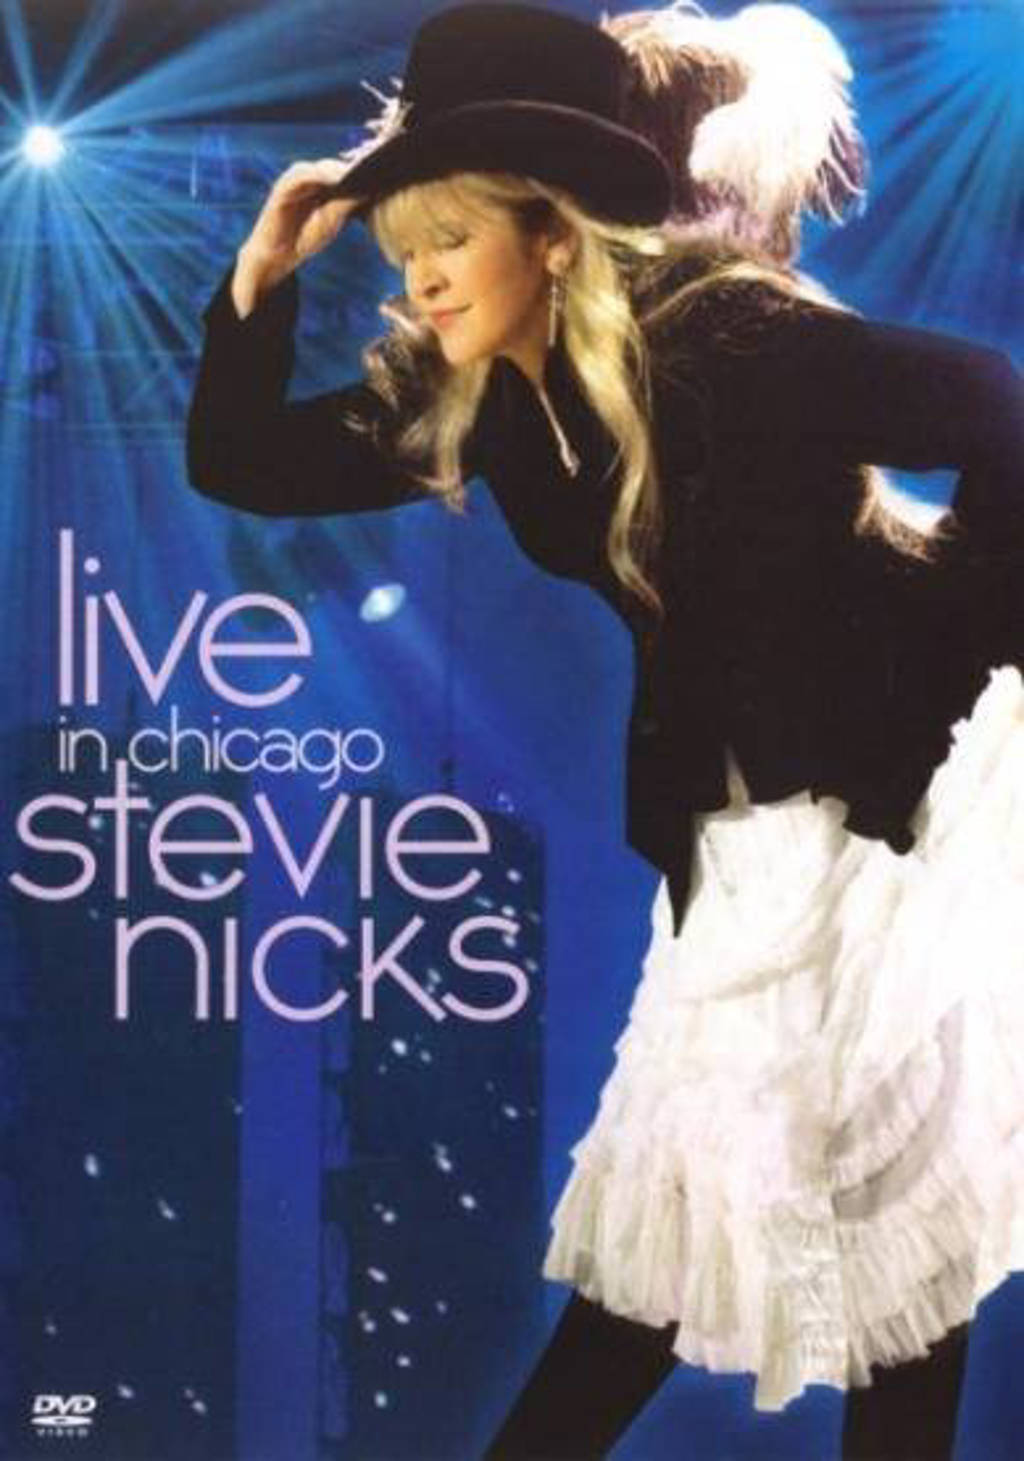 Stevie Nicks - Live In Chicago (Dv) (DVD)